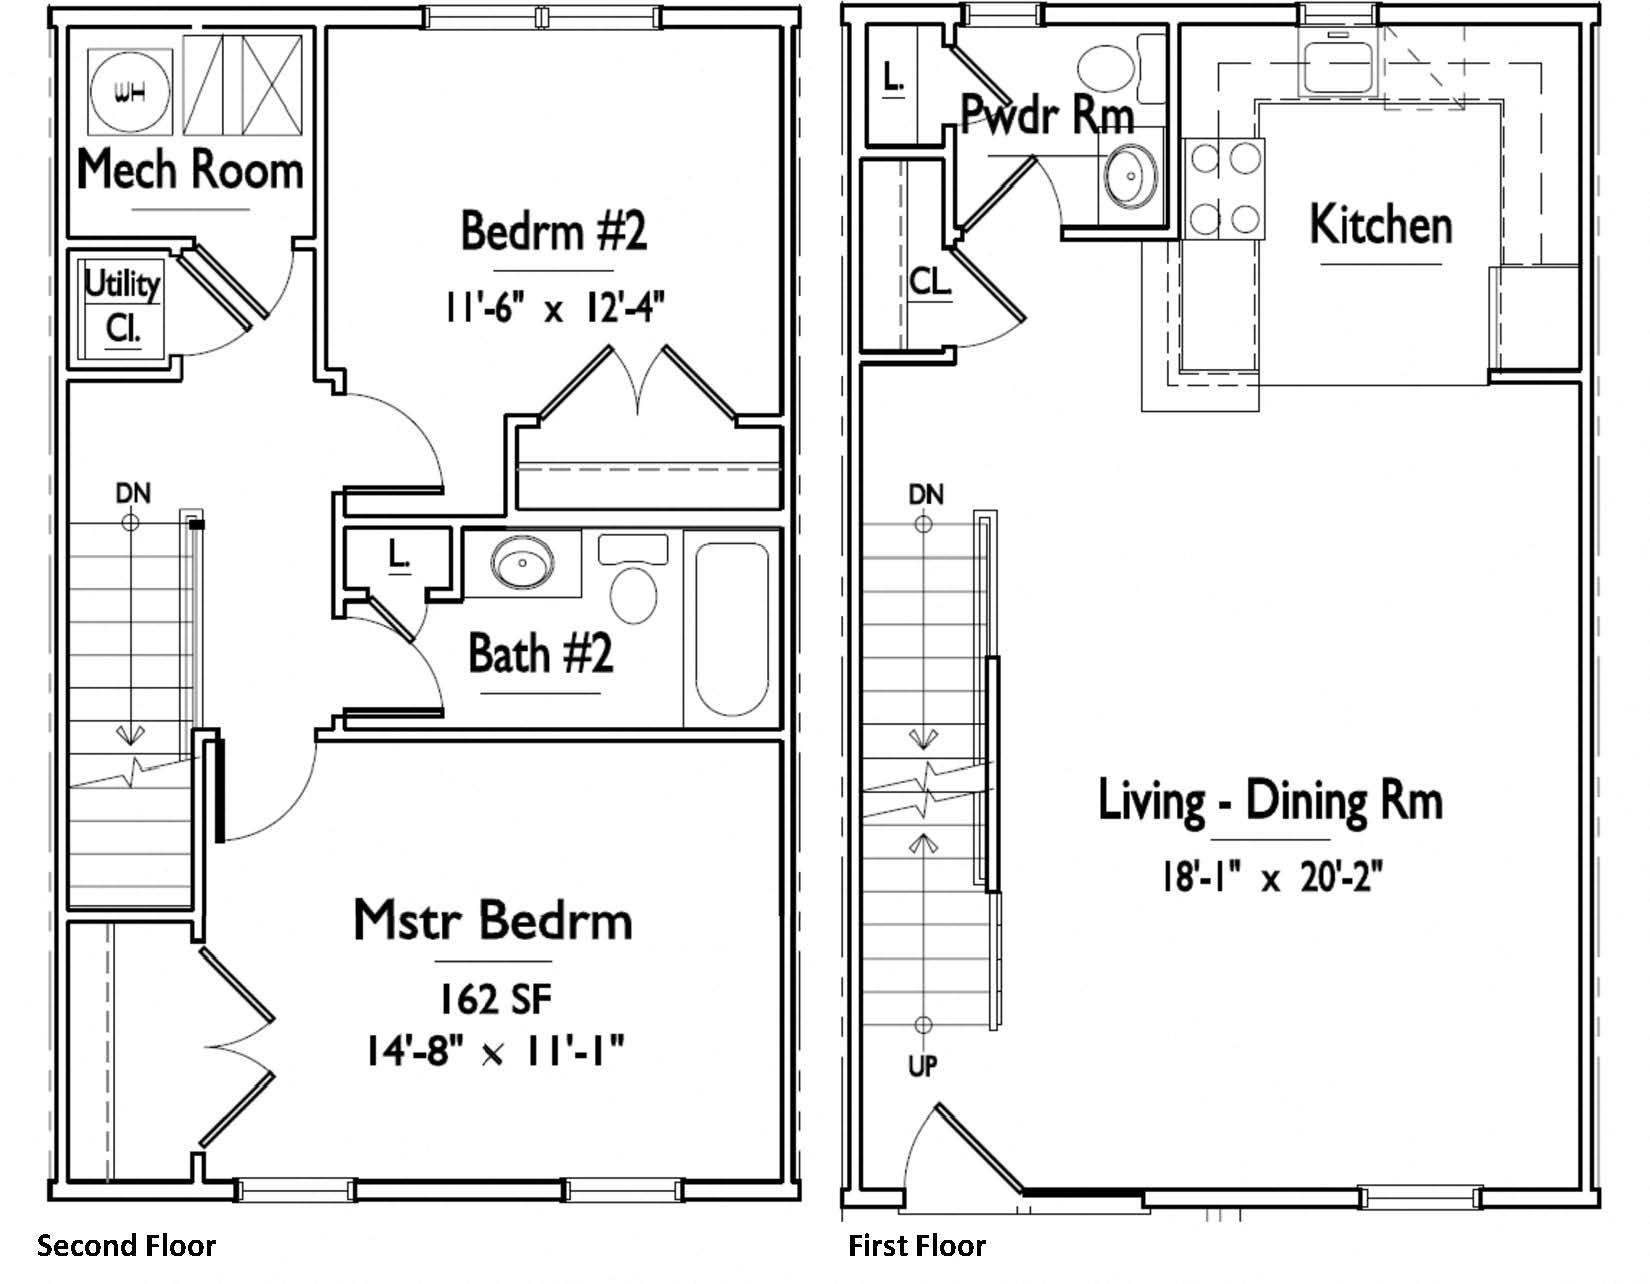 philadelphia townhouse floor plan new home design ideas 10 elaborate floor plans pre world war i new trend home